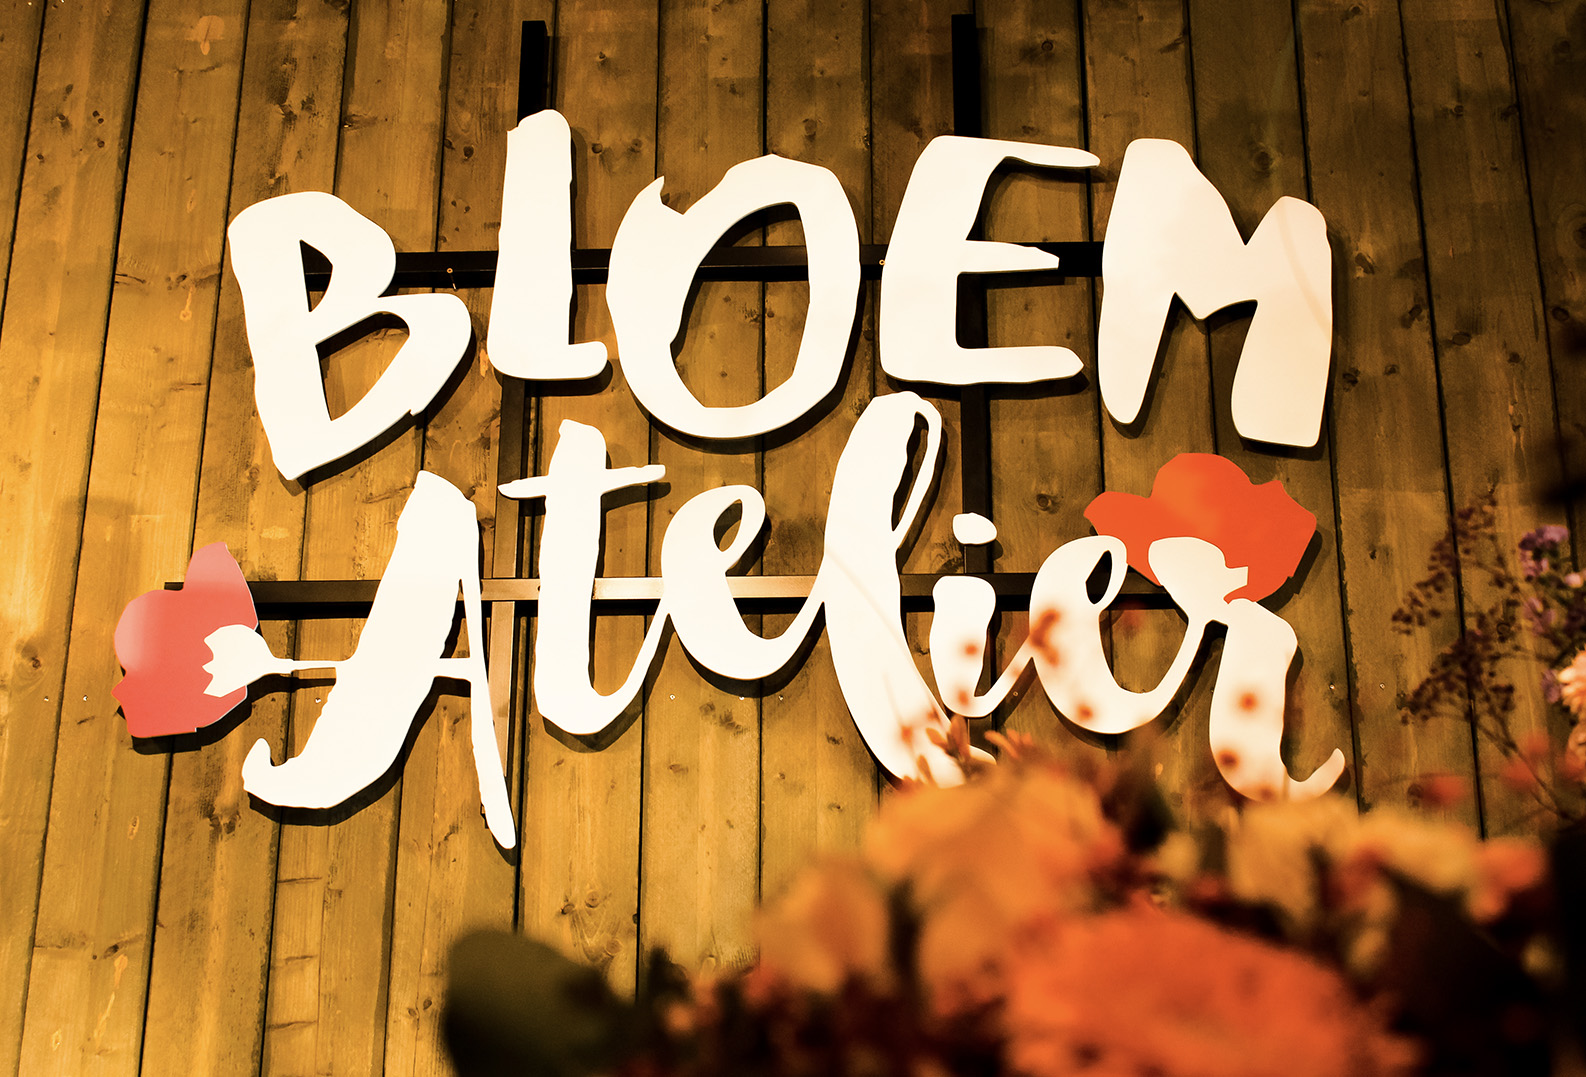 Bloem Atelier - bloemist in Hoorn